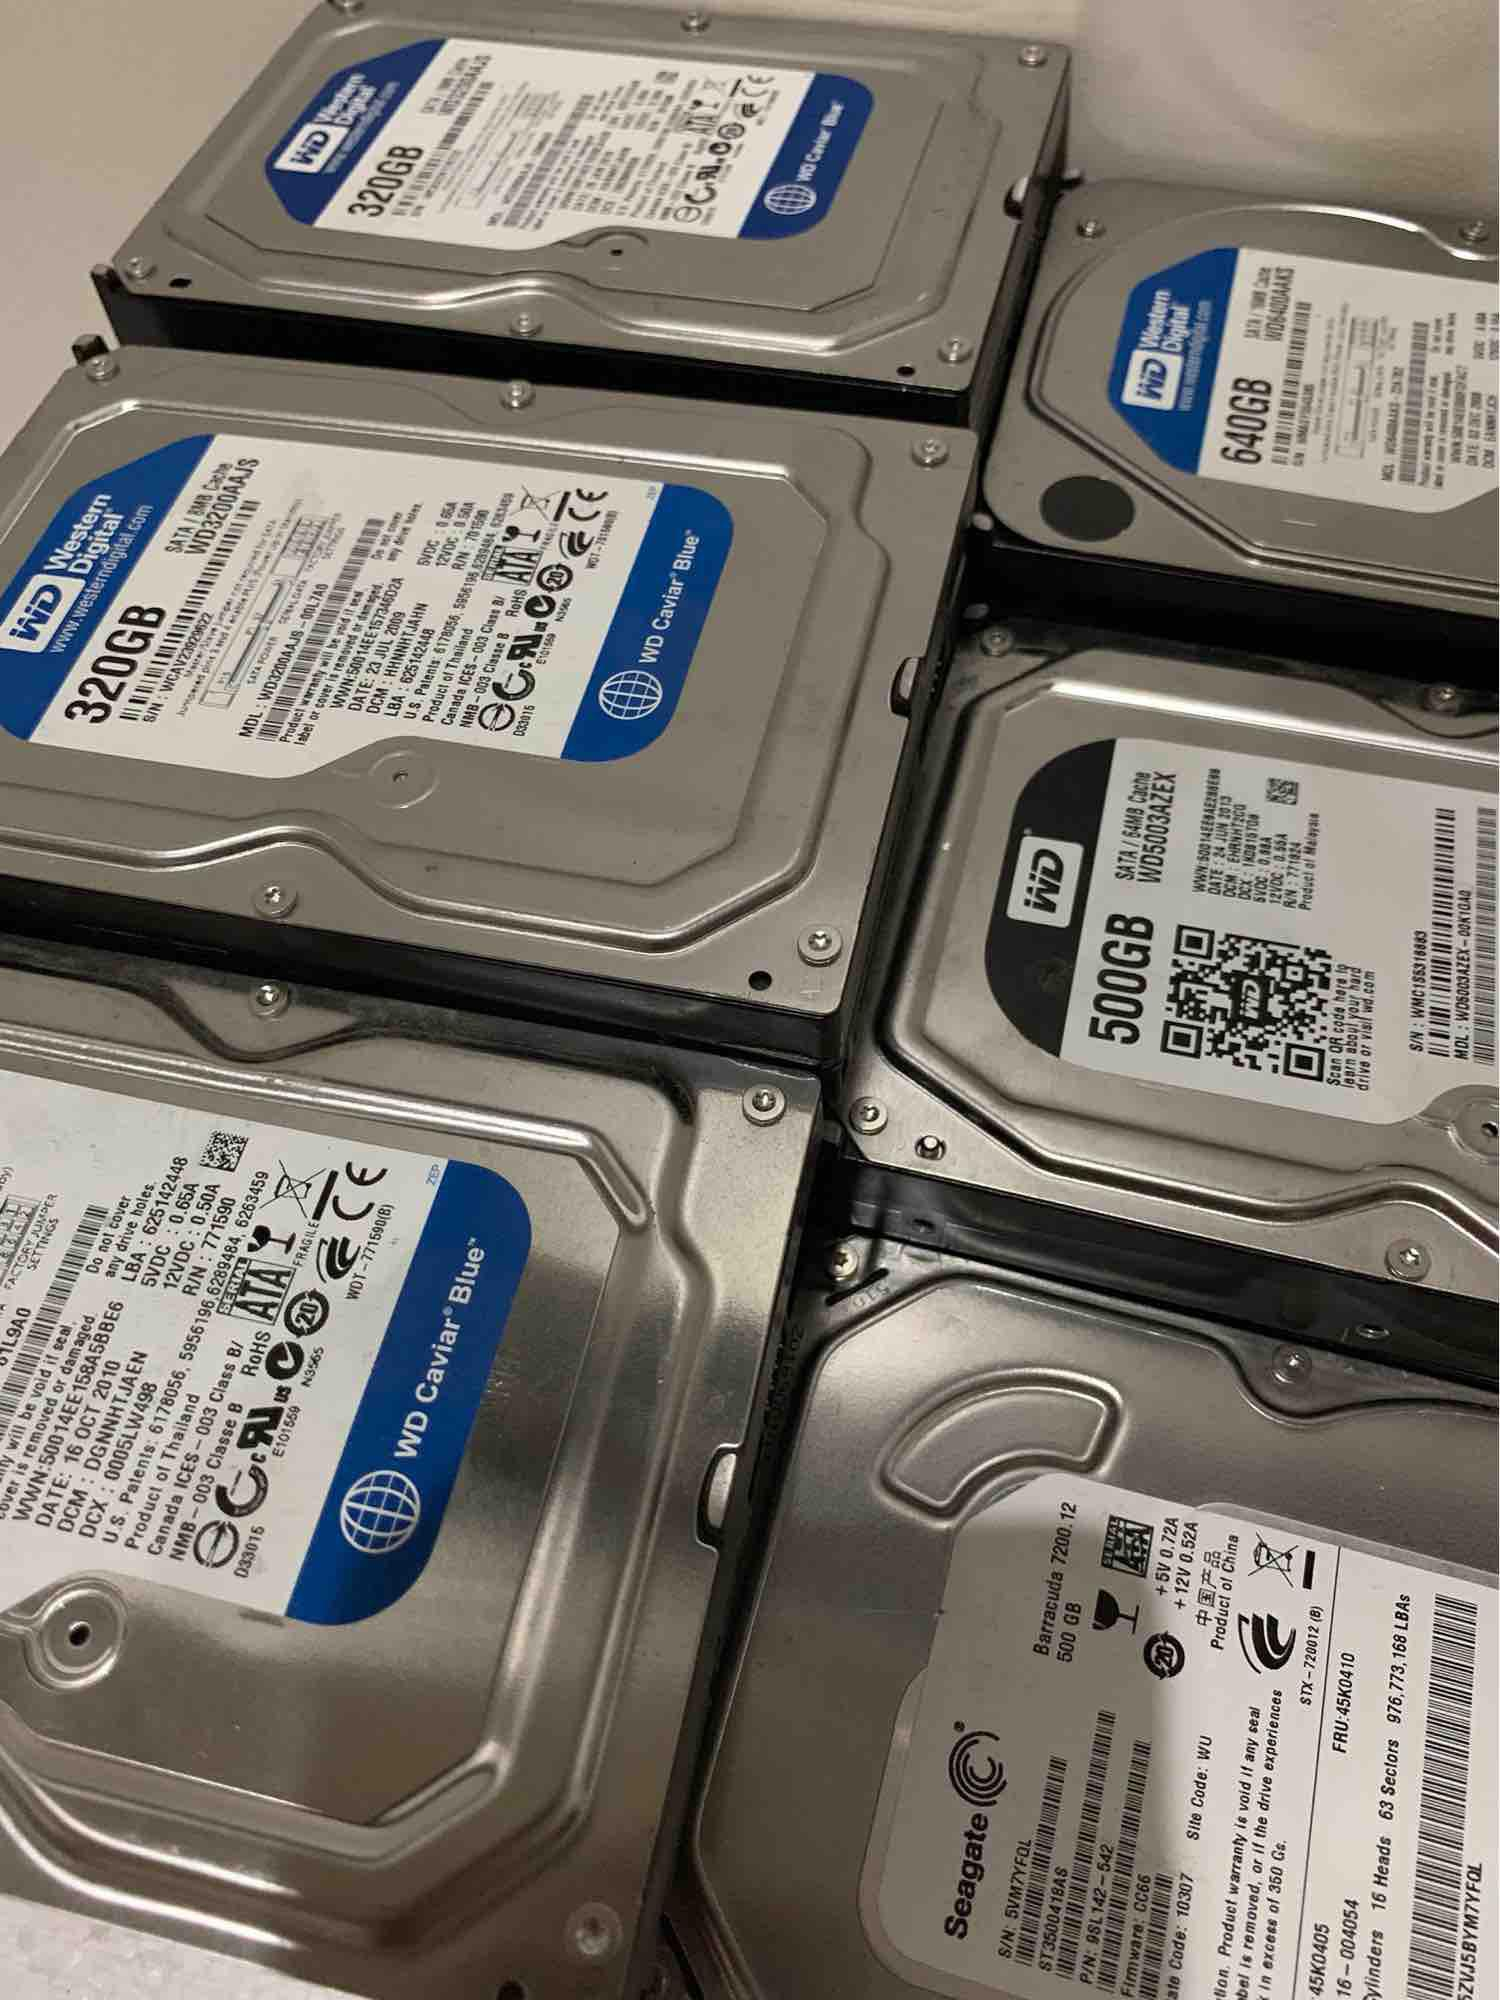 hdd for sale hard disk drives price brands offers online rh lazada com ph